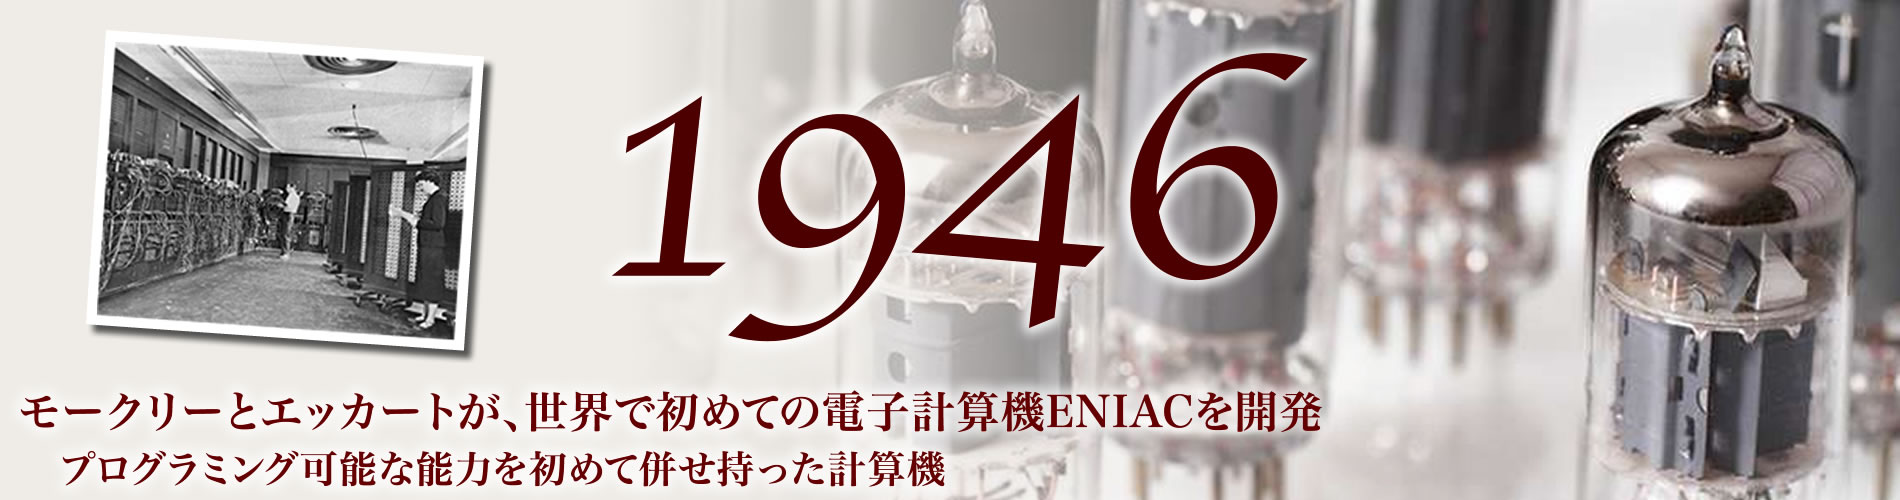 1946年、世界初の電子計算機ENIACが開発